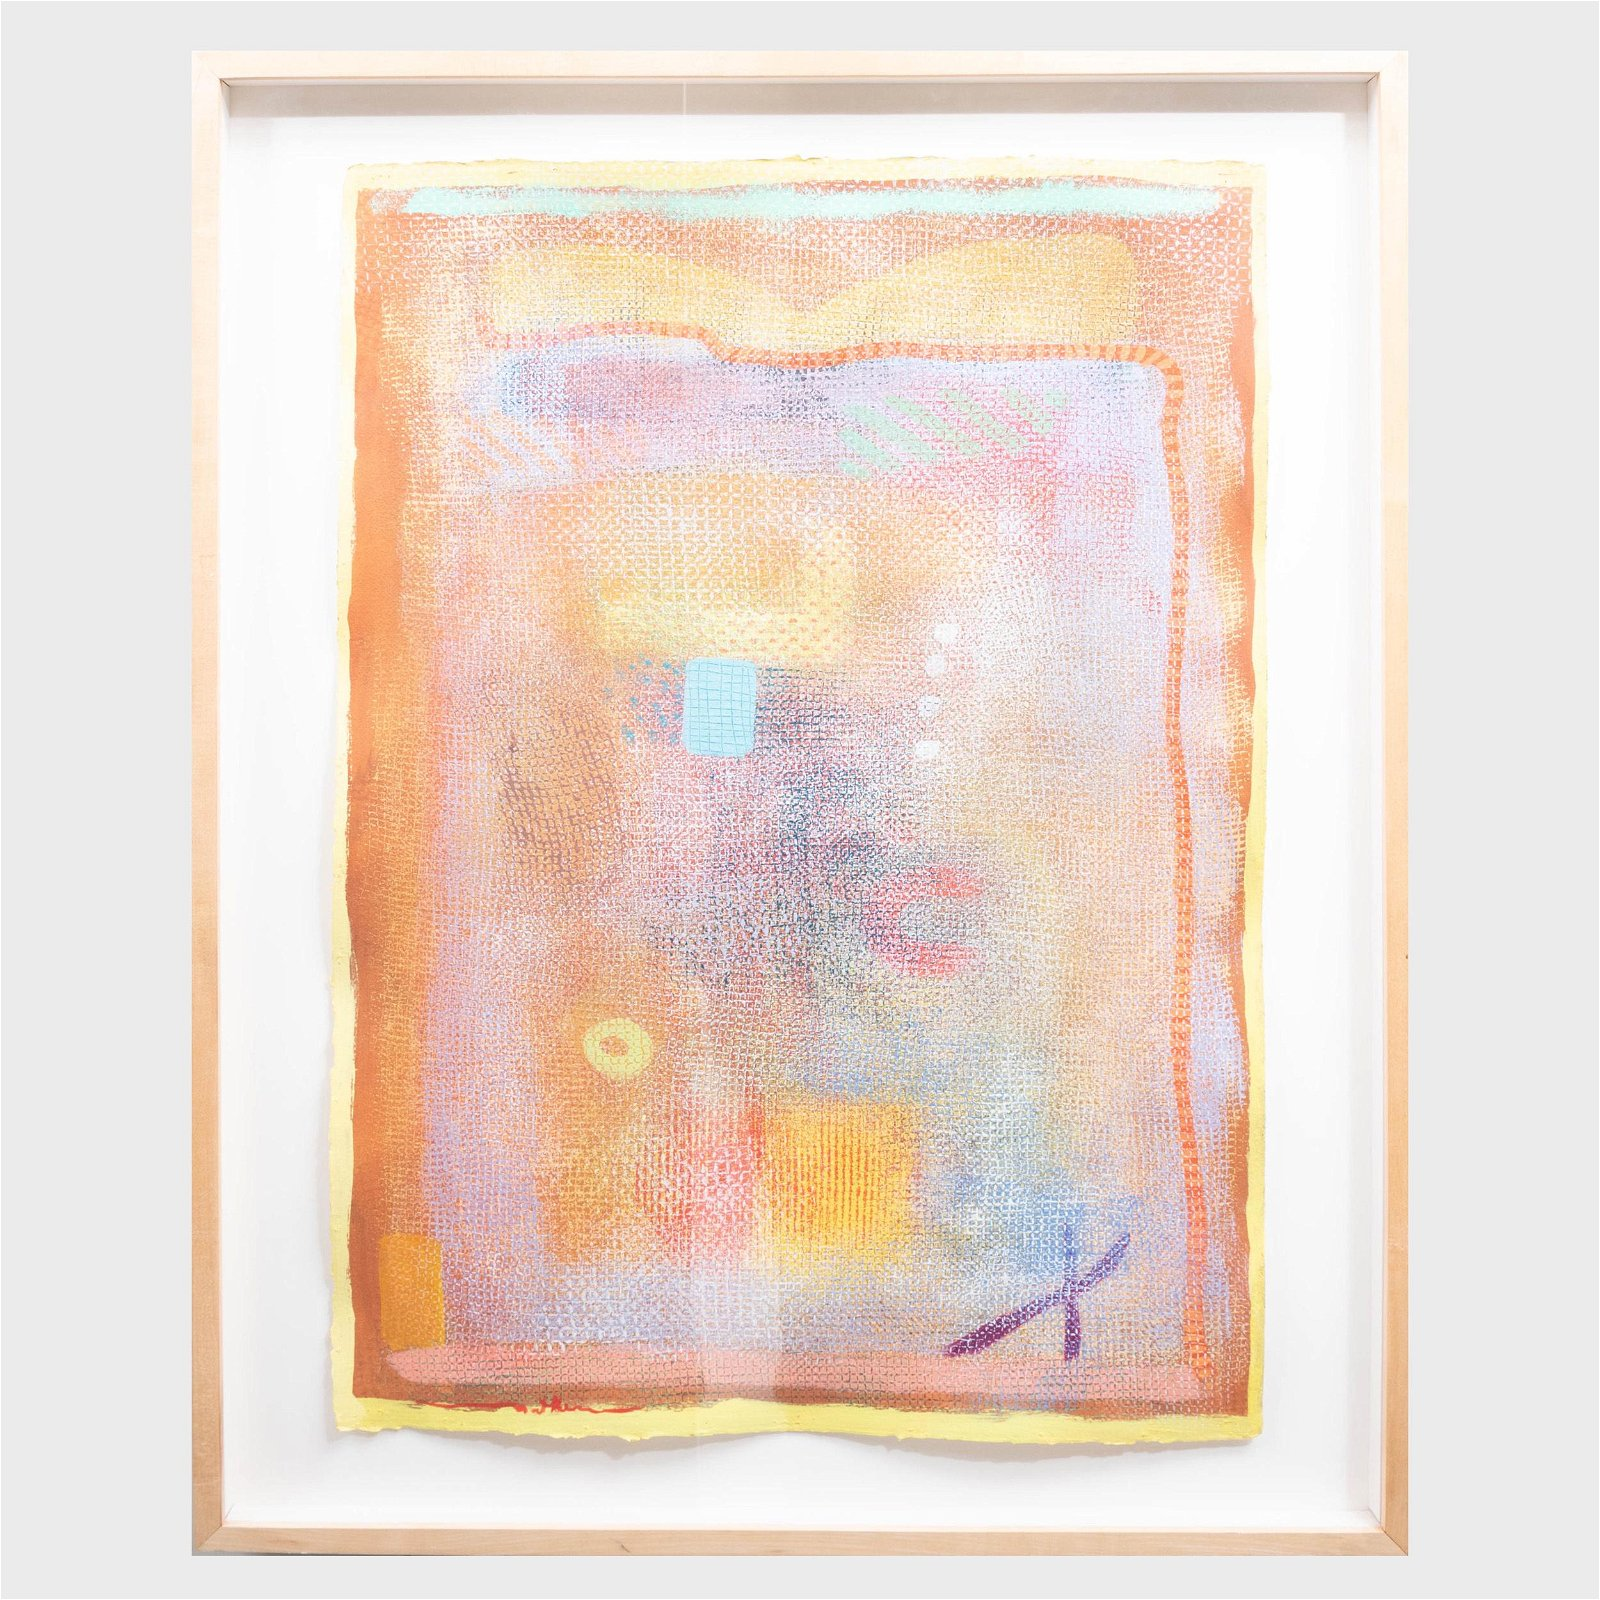 Robert Natkin (1930-2010): Untitled